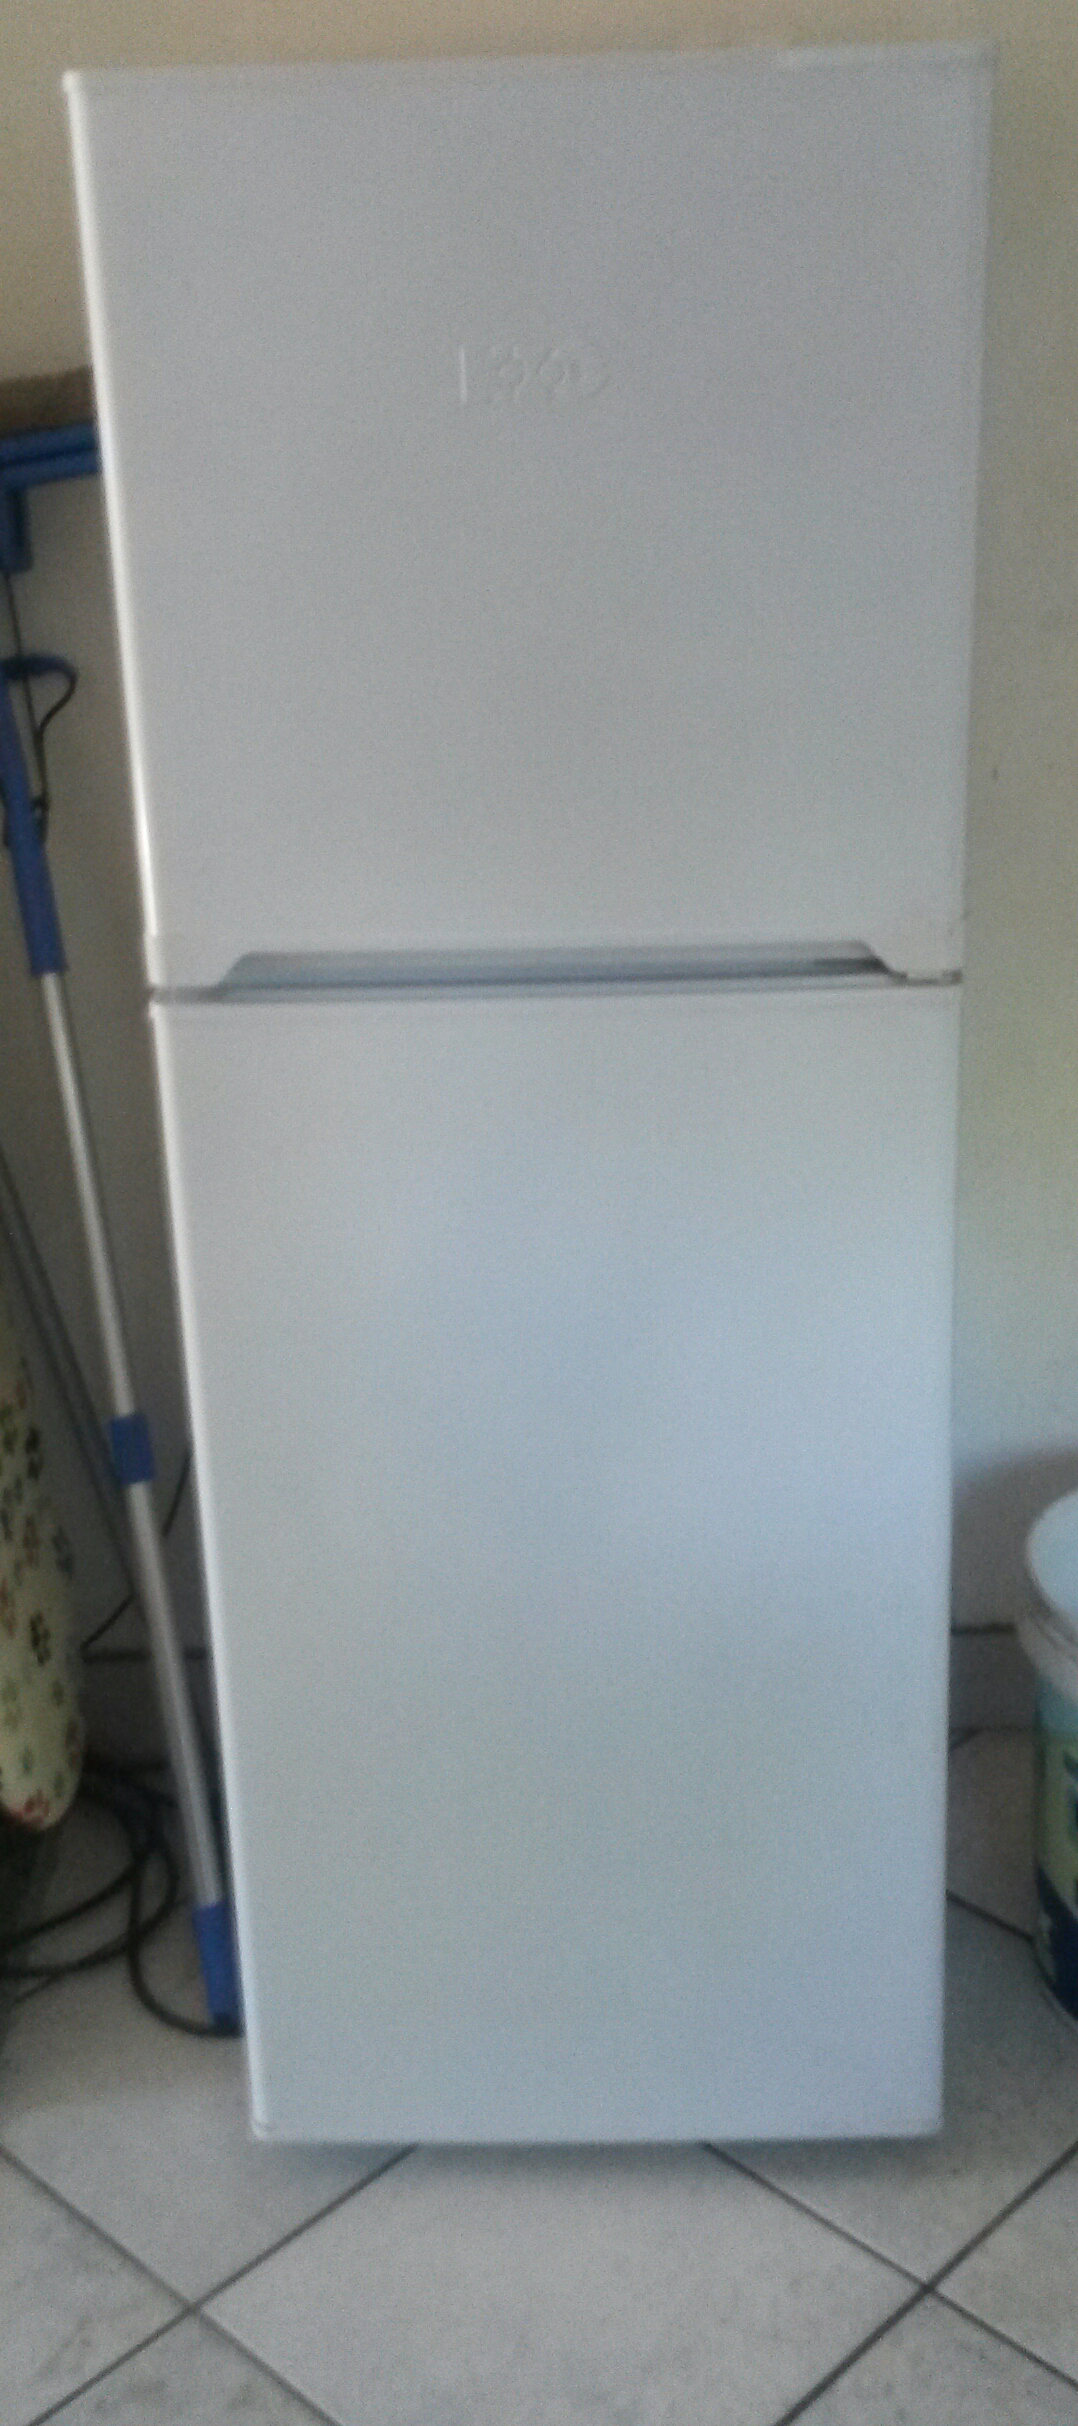 KIC top freezer fridge 170lt for sale